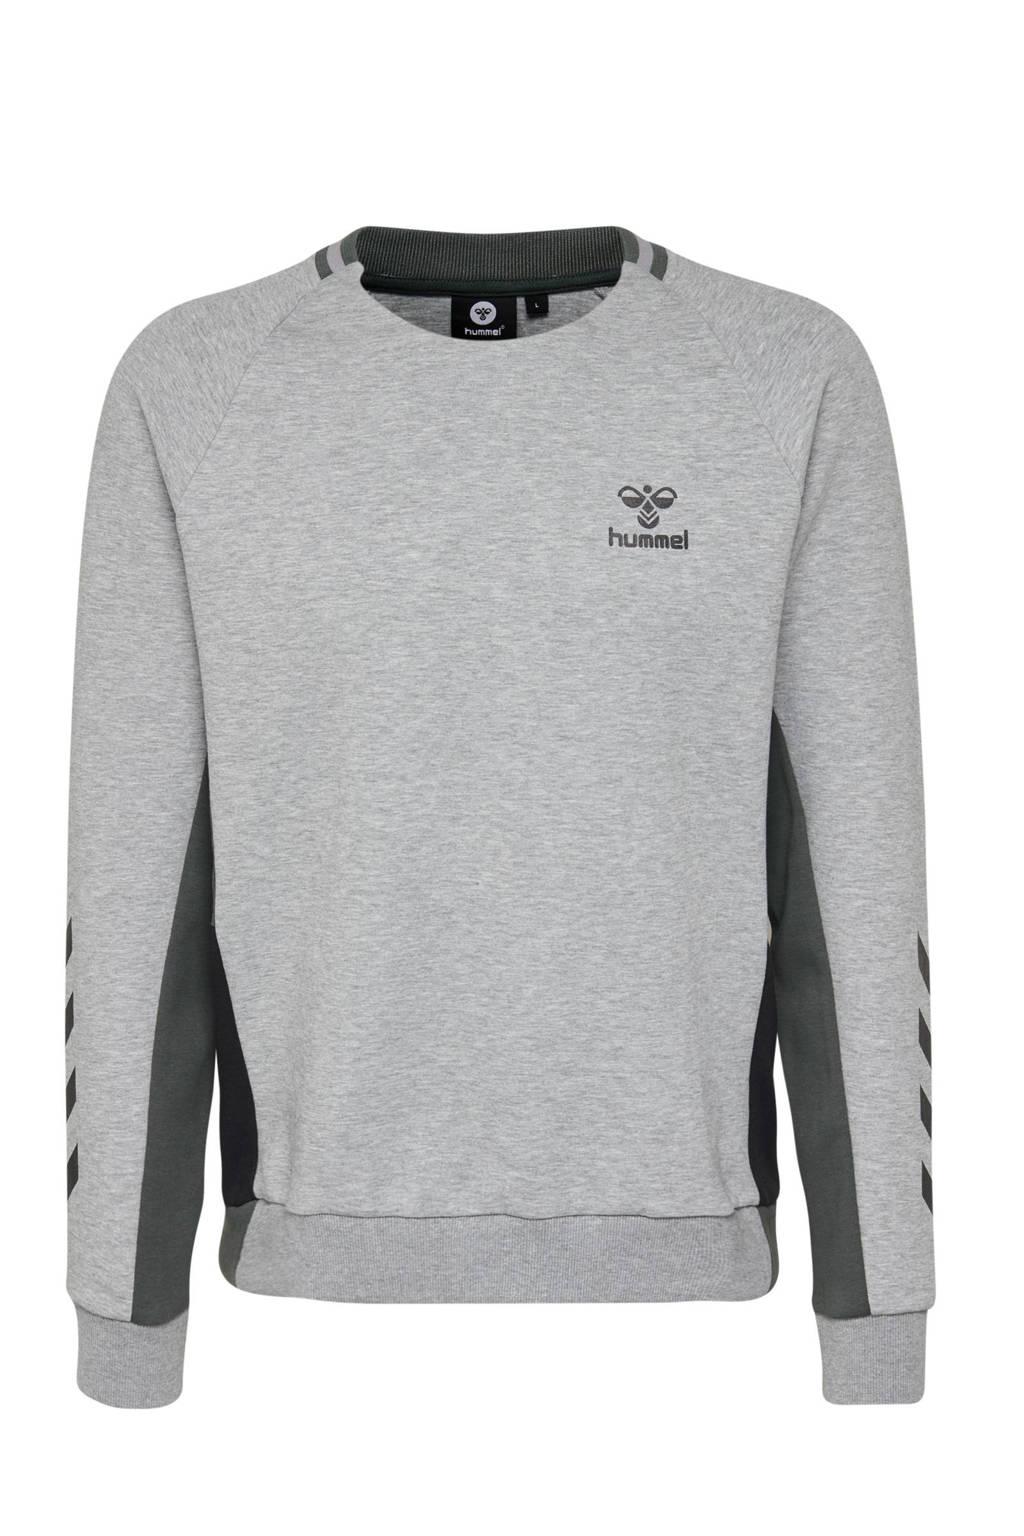 hummel   sportsweater grijs, Grijs